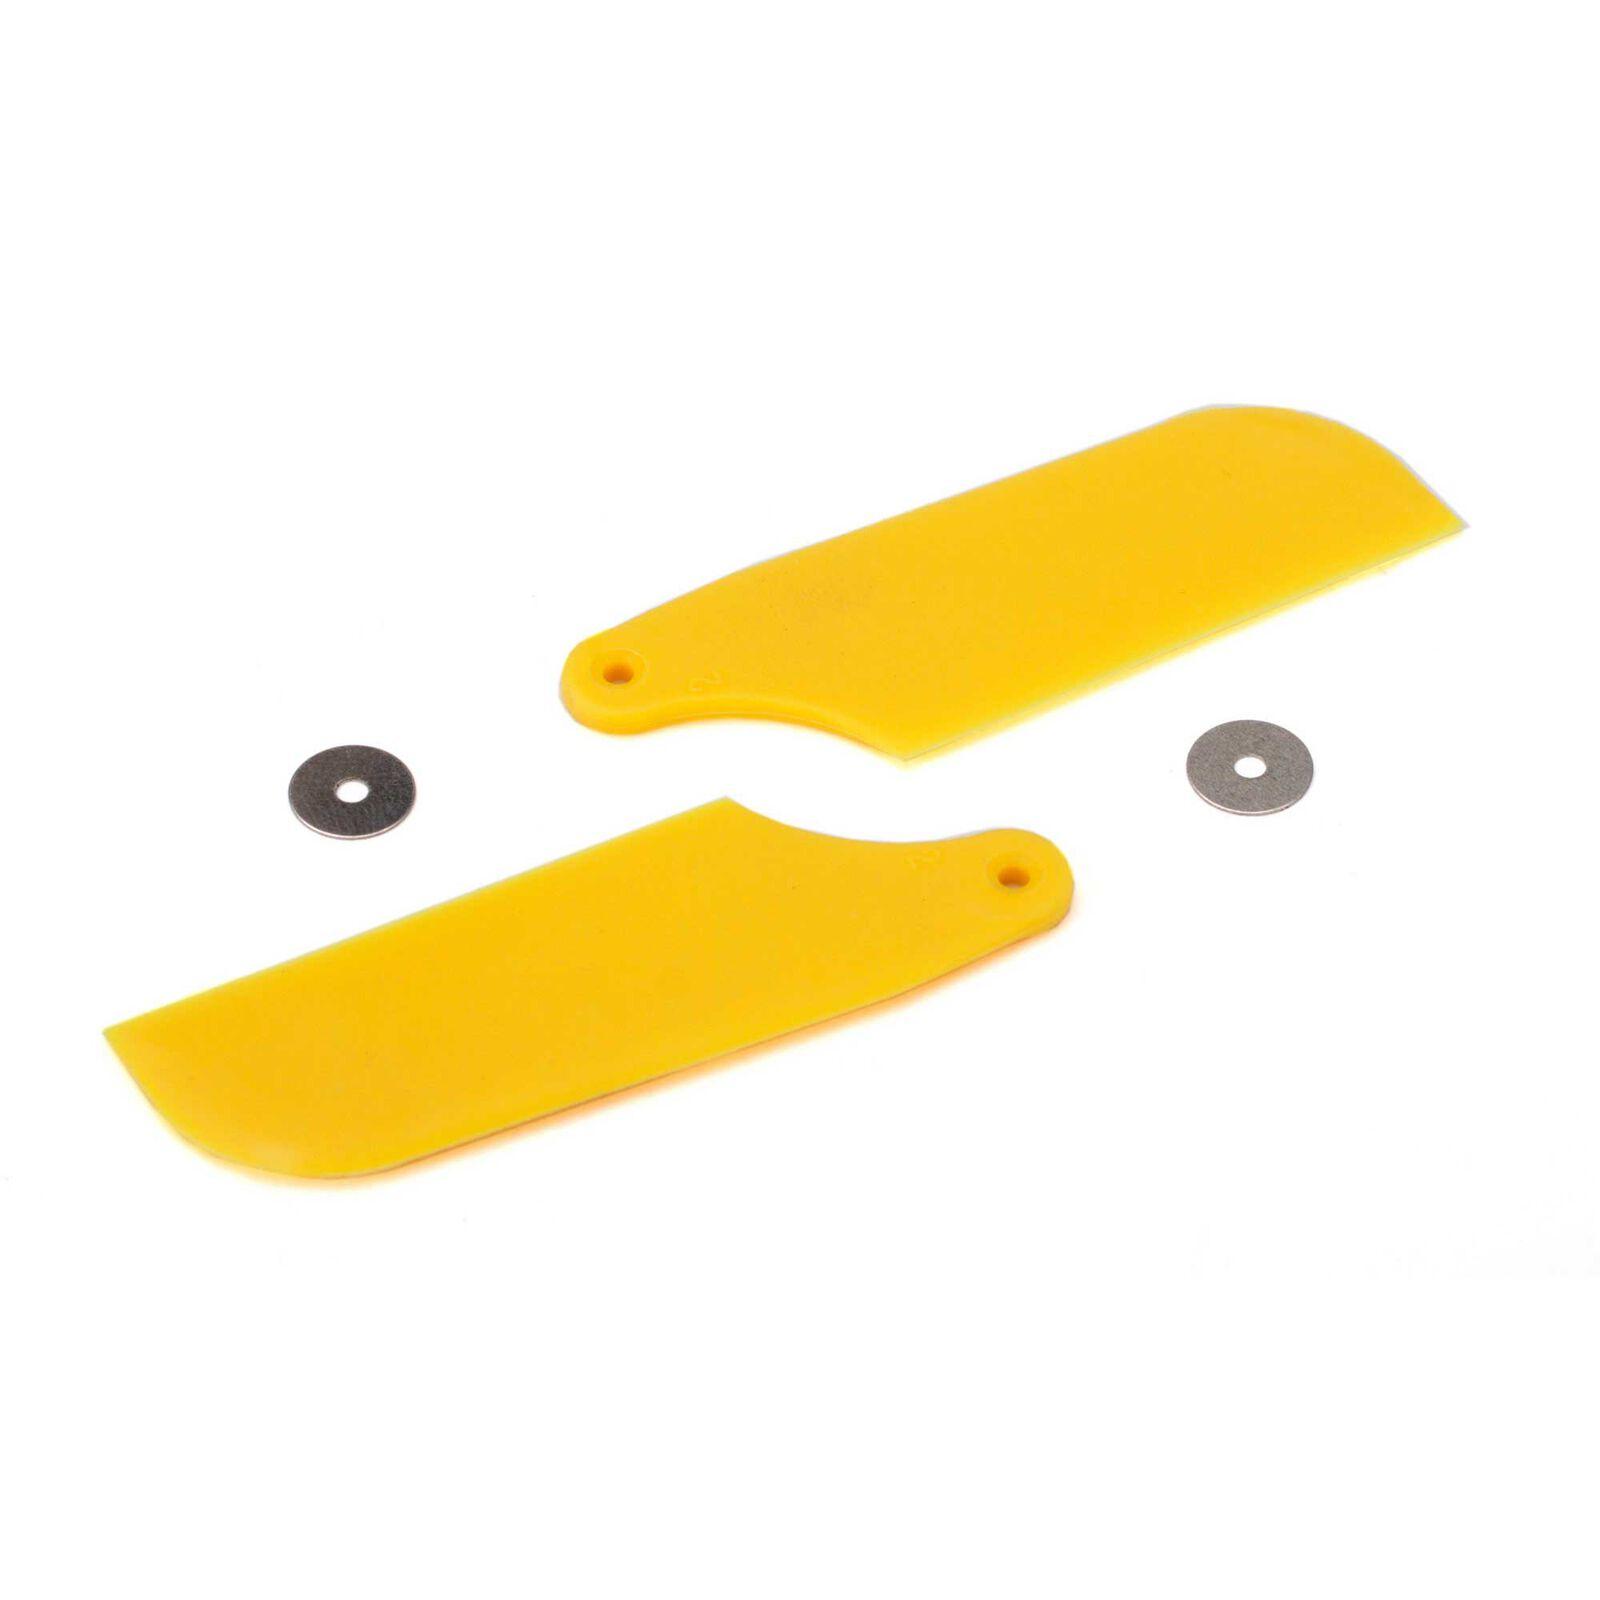 Tail Rotor Blade Set, Yellow: B450 3D, B400, B450 X